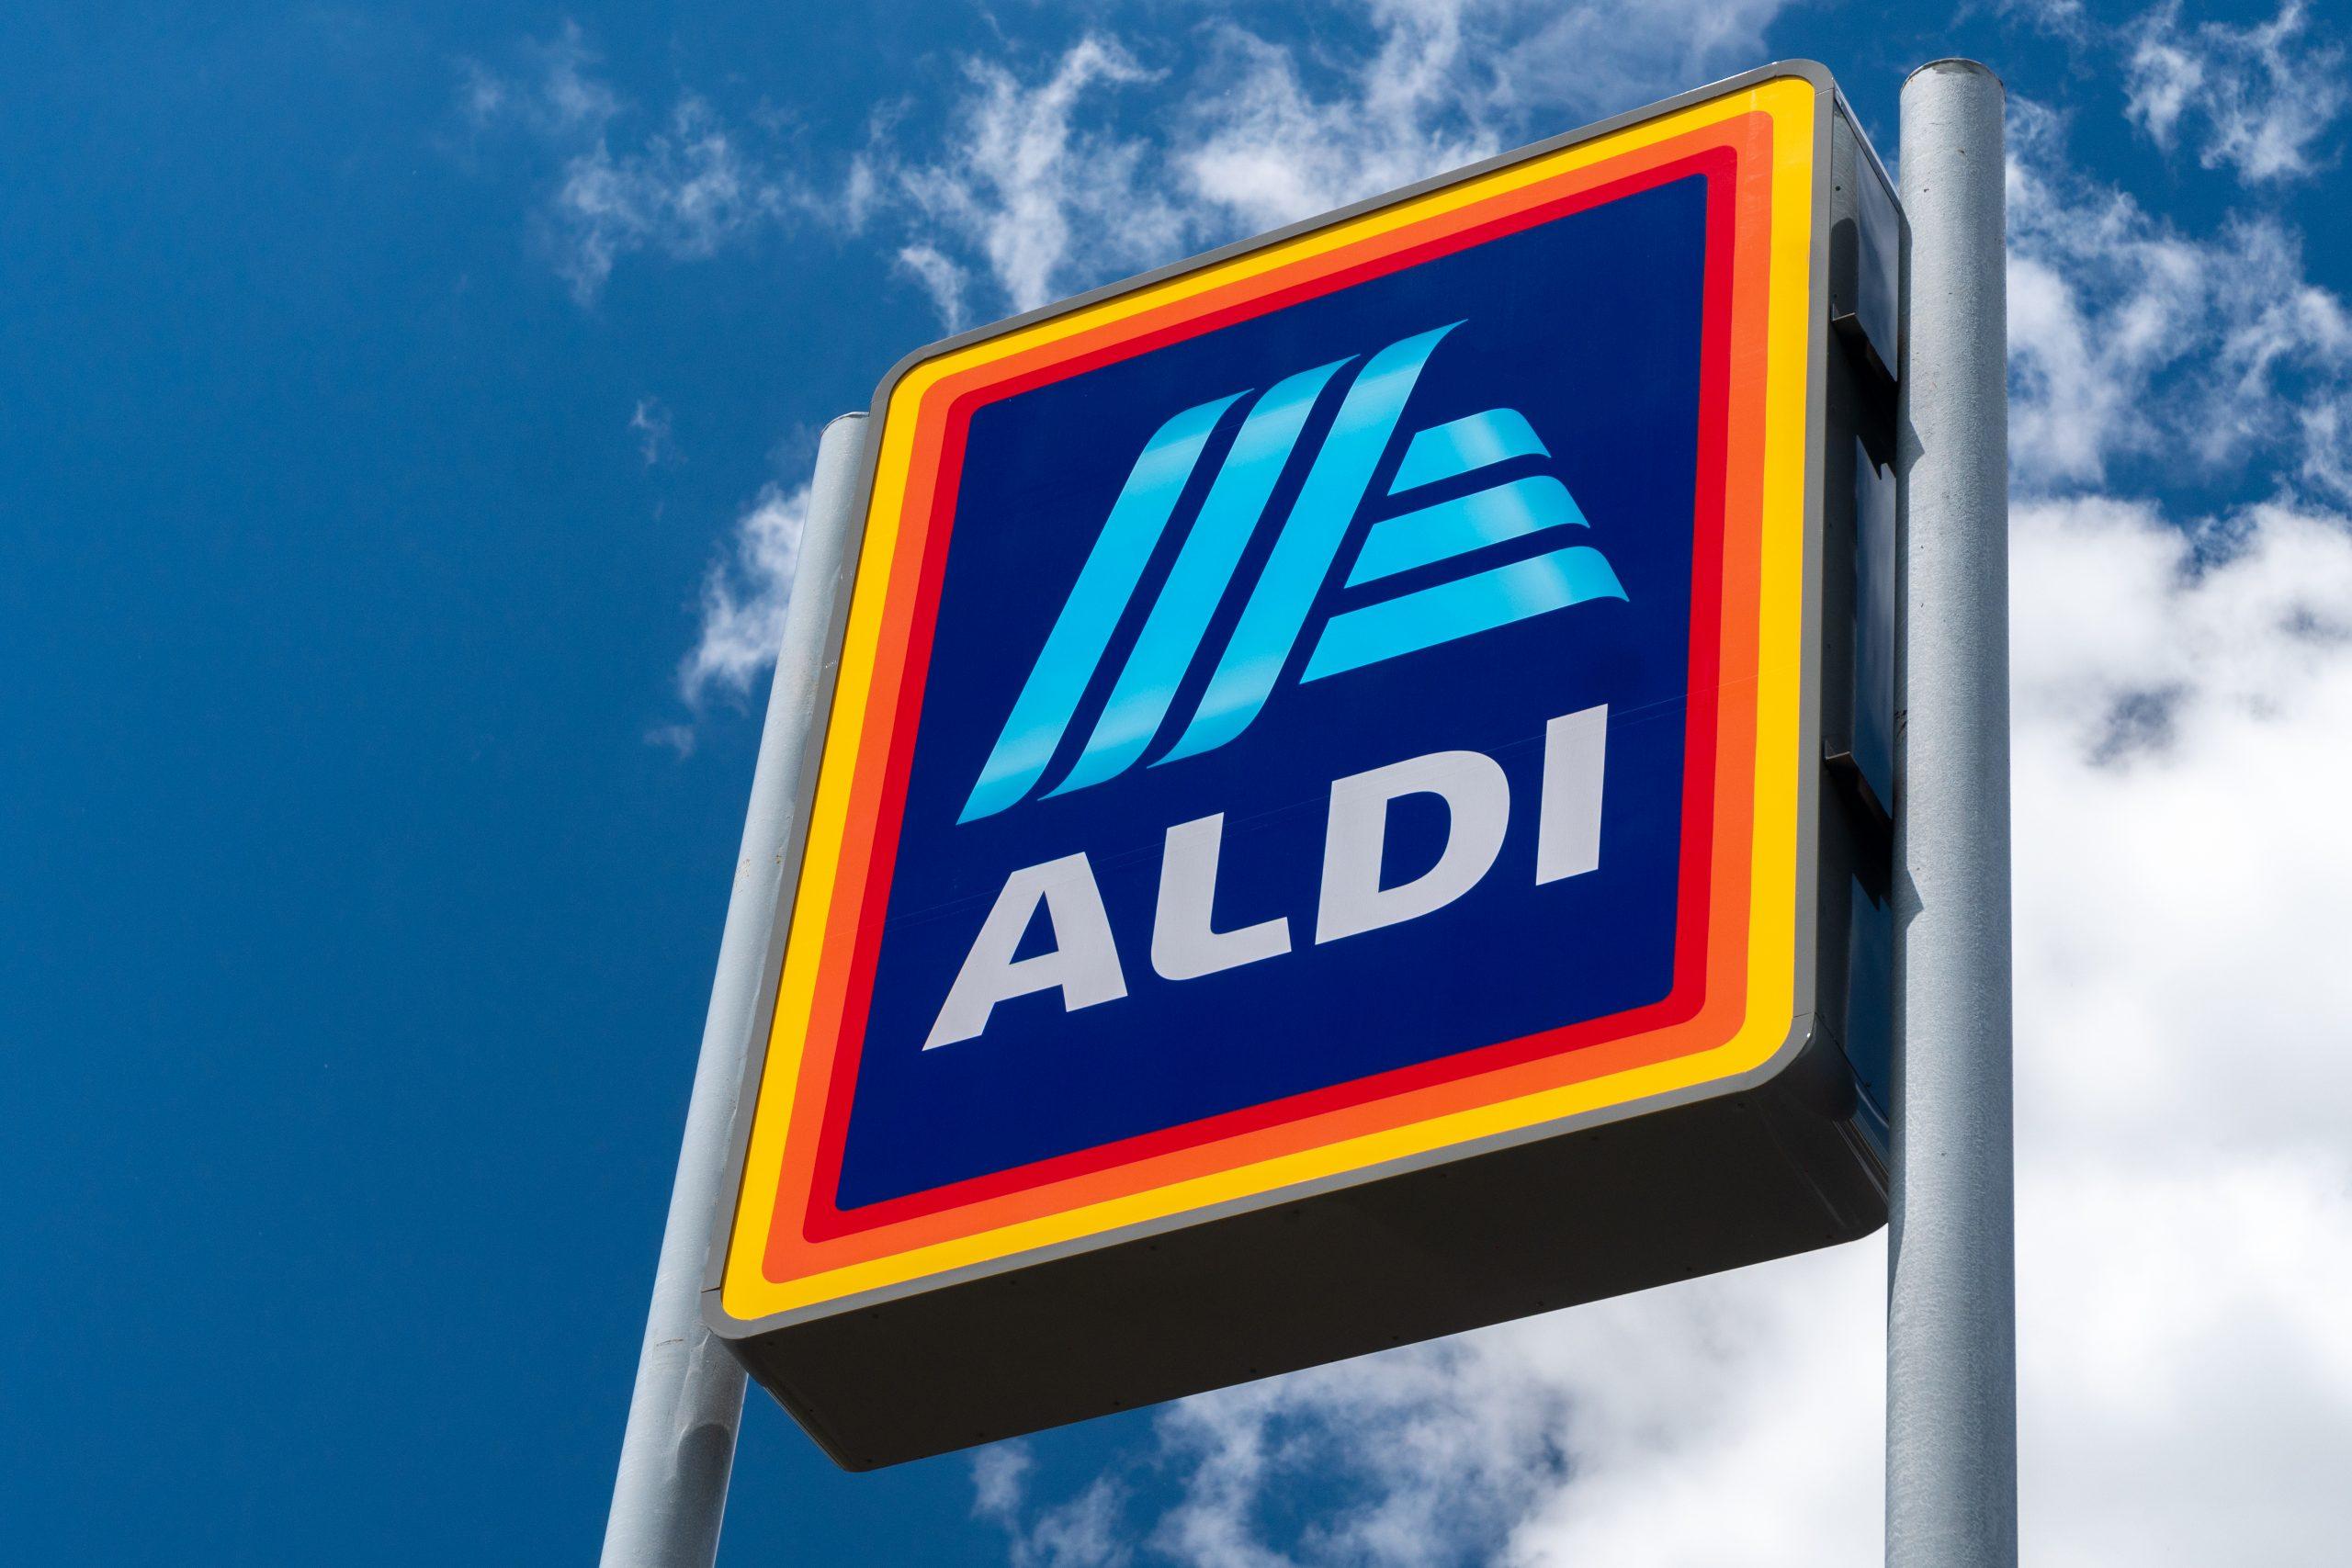 RGDATA's complaint upheld regarding Aldi's Swap & Save Campaign